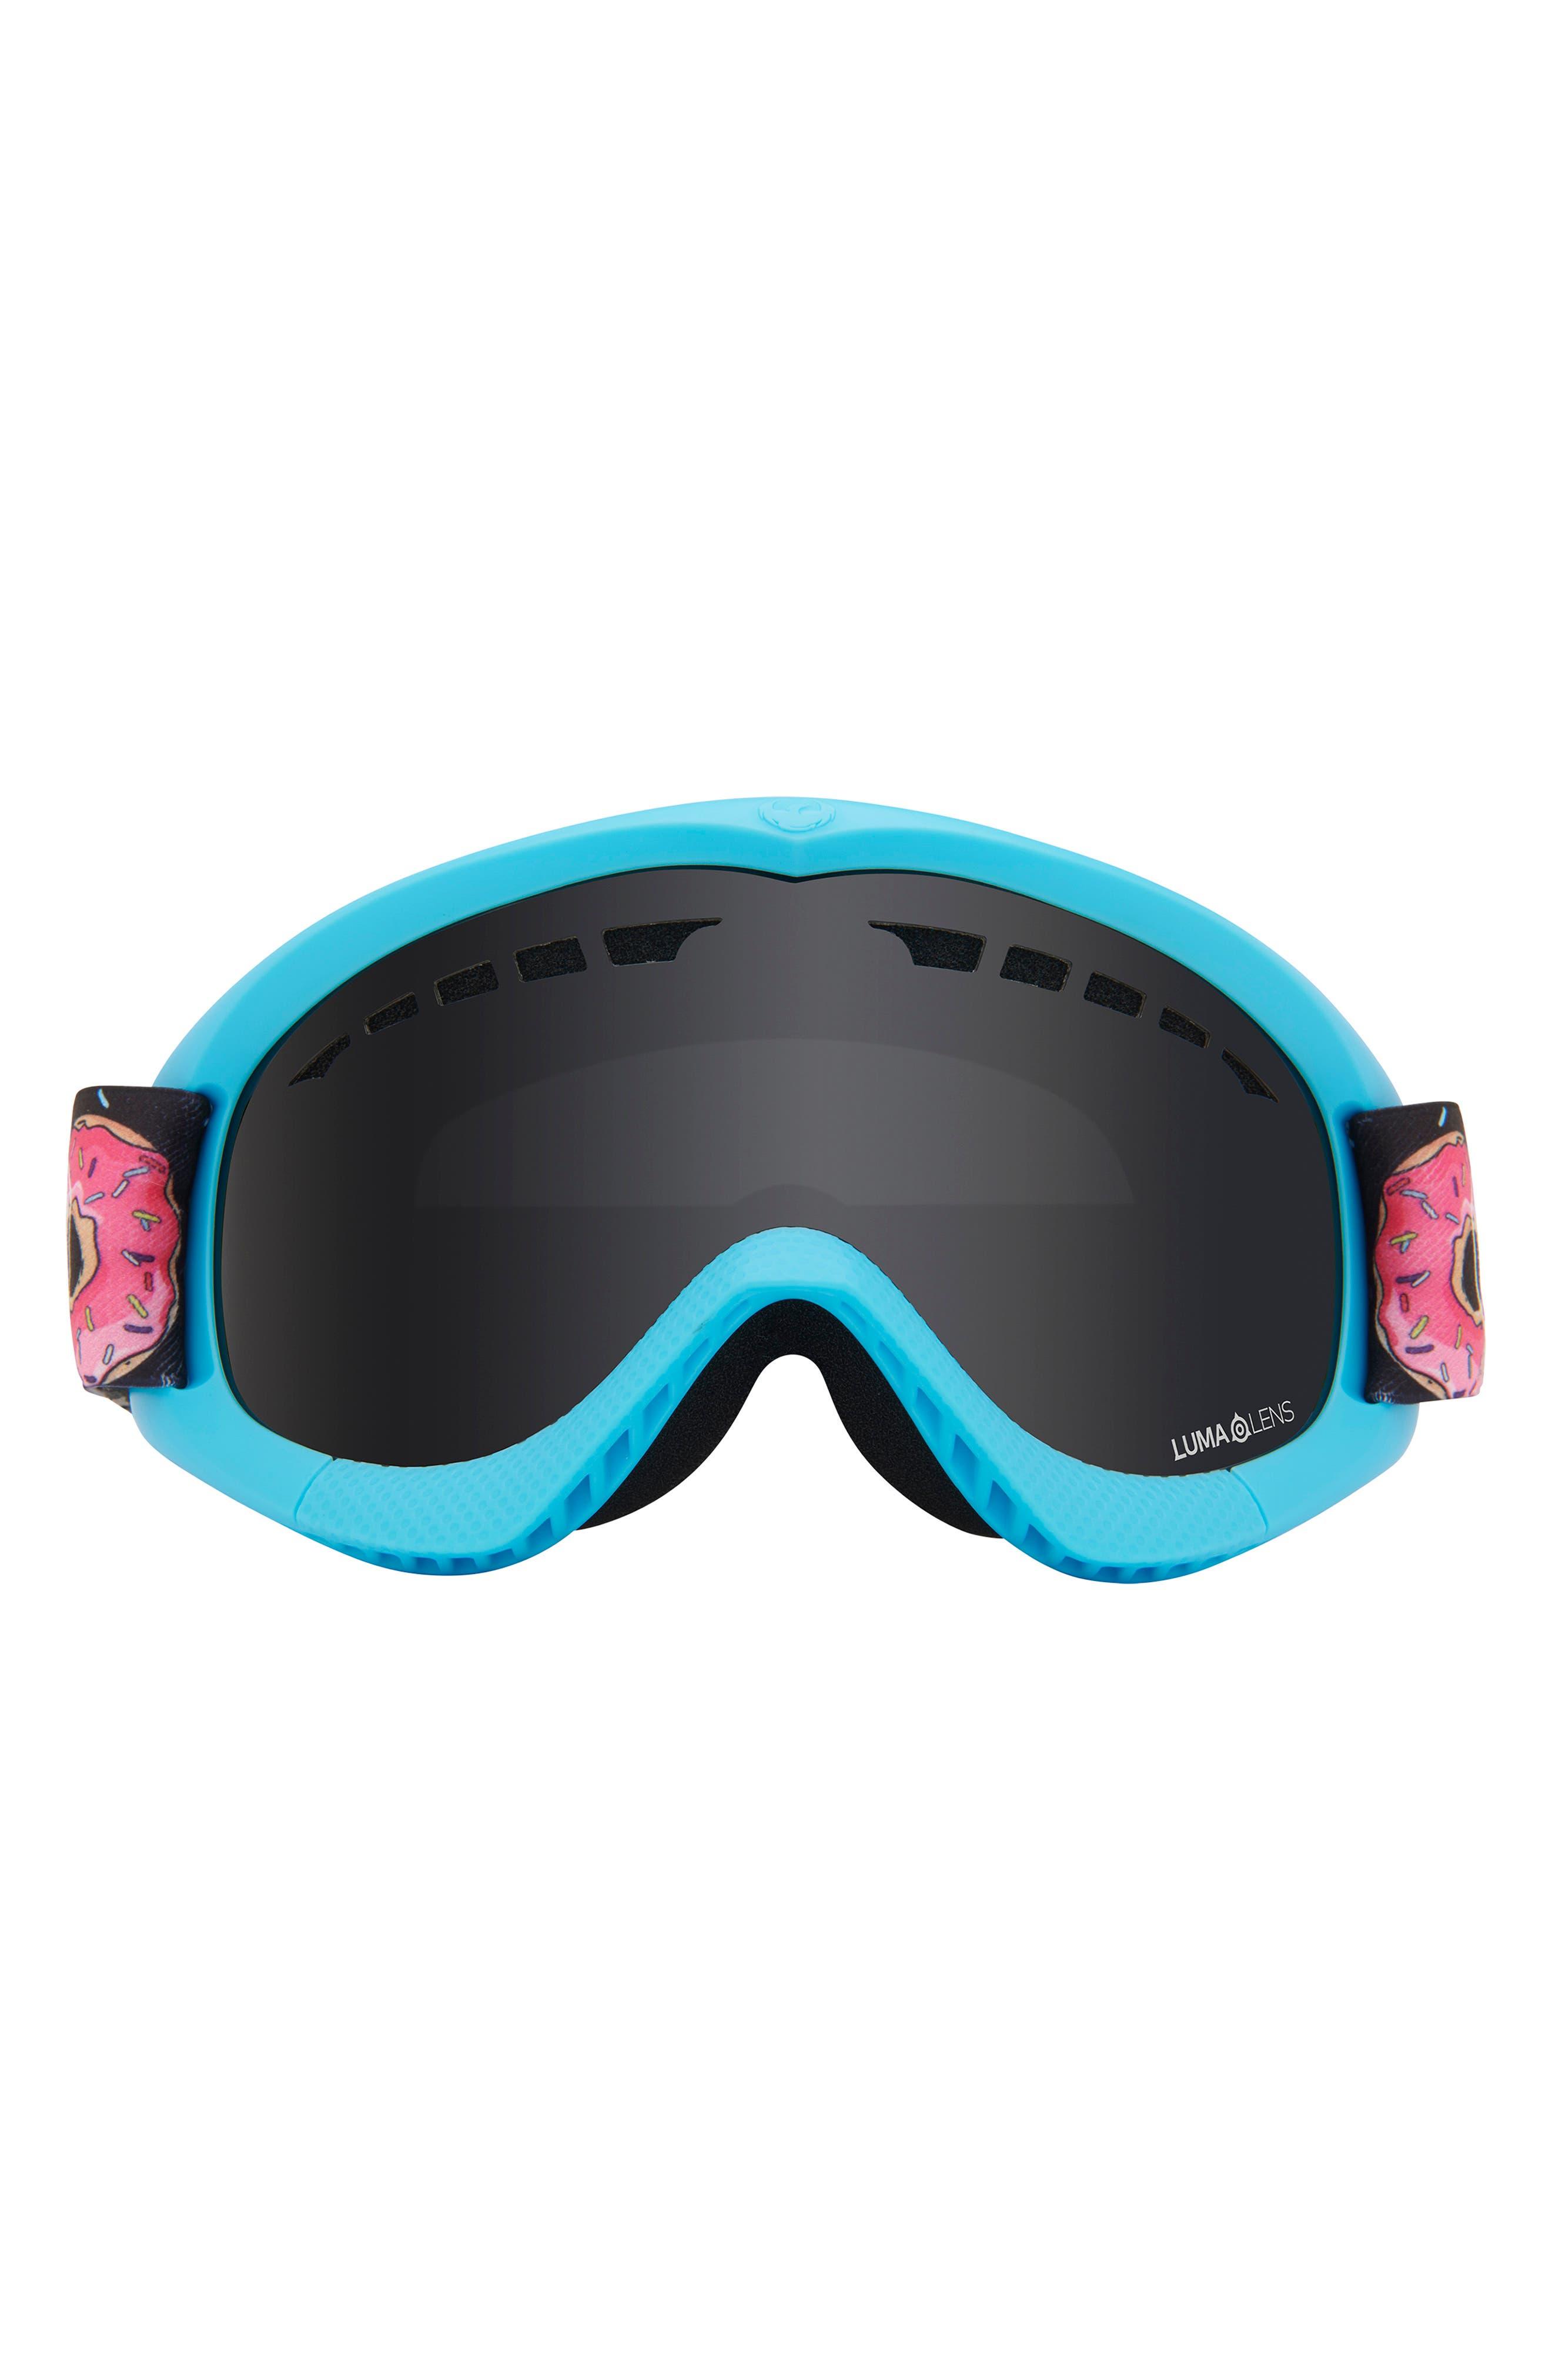 Dxs Base 60mm Snow Goggles